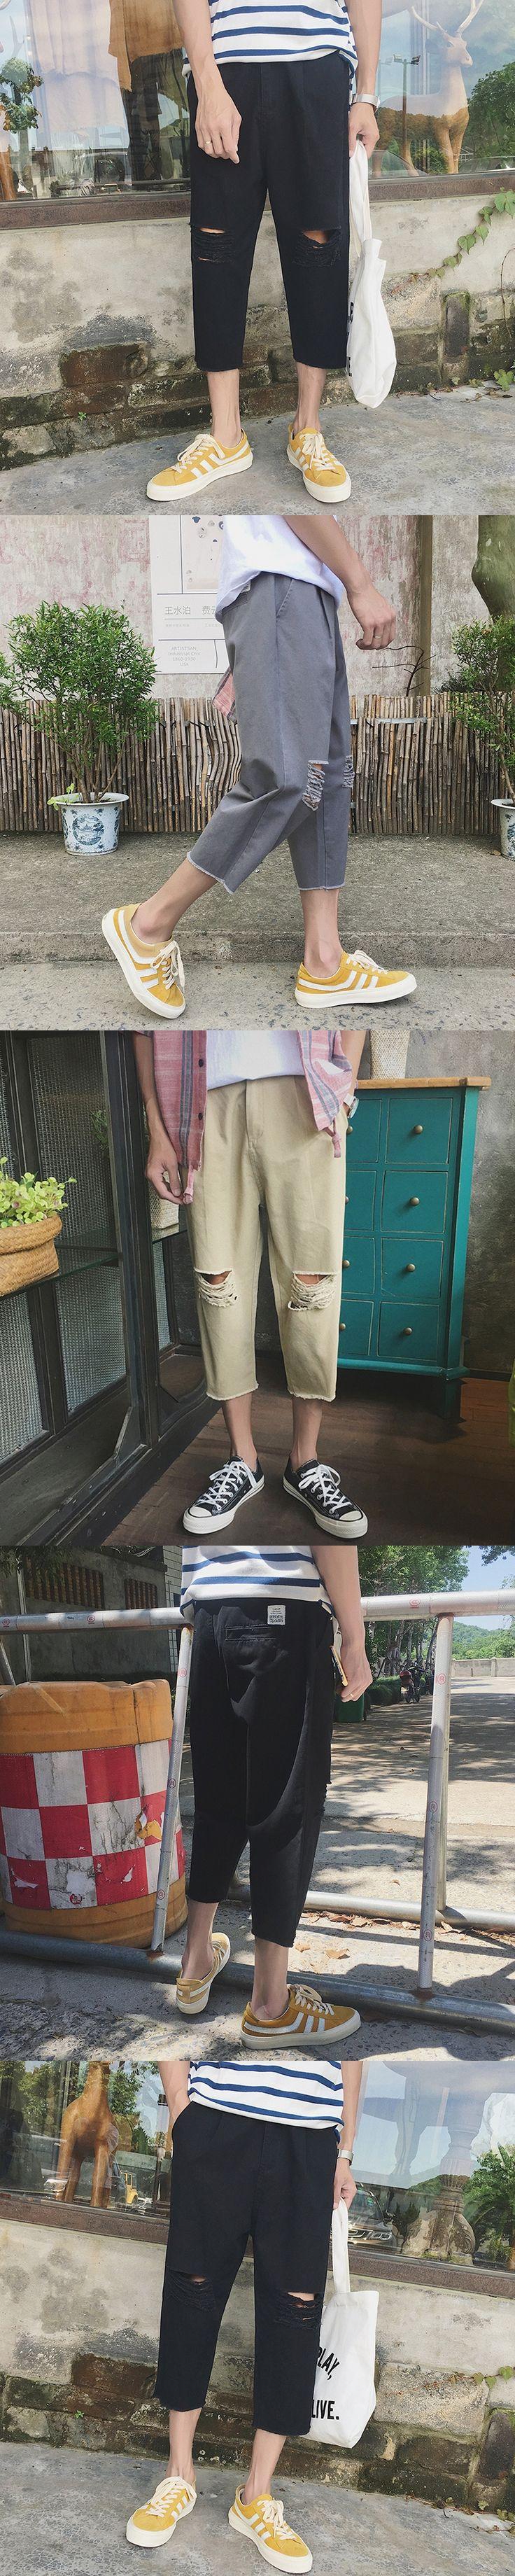 2017summer men casual pants Korean version of the knee broken holes water seven points small trousers hot sales grey/black/khaki